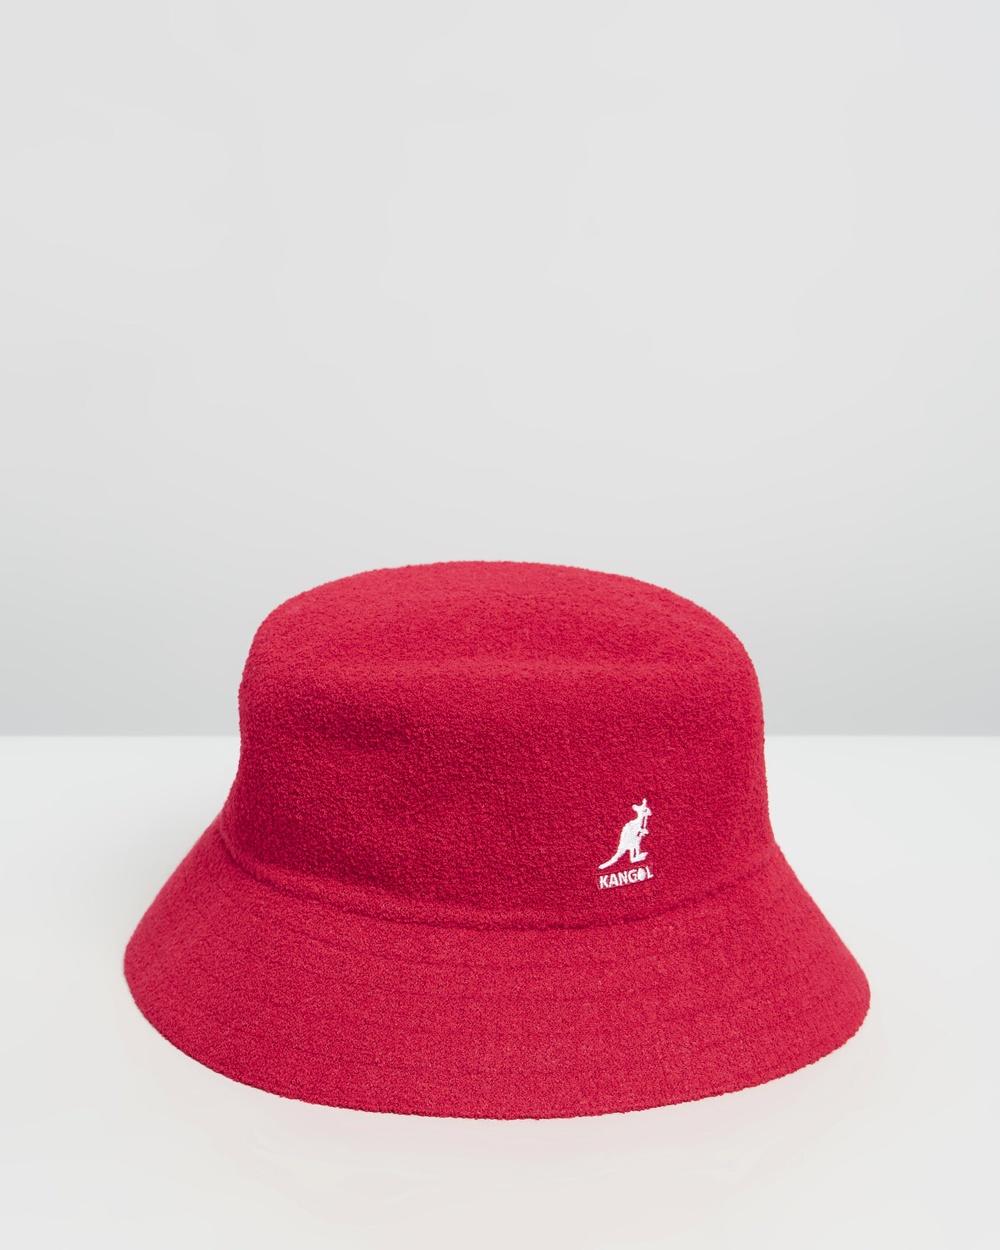 Kangol Bermuda Bucket Hat Hats Scarlet